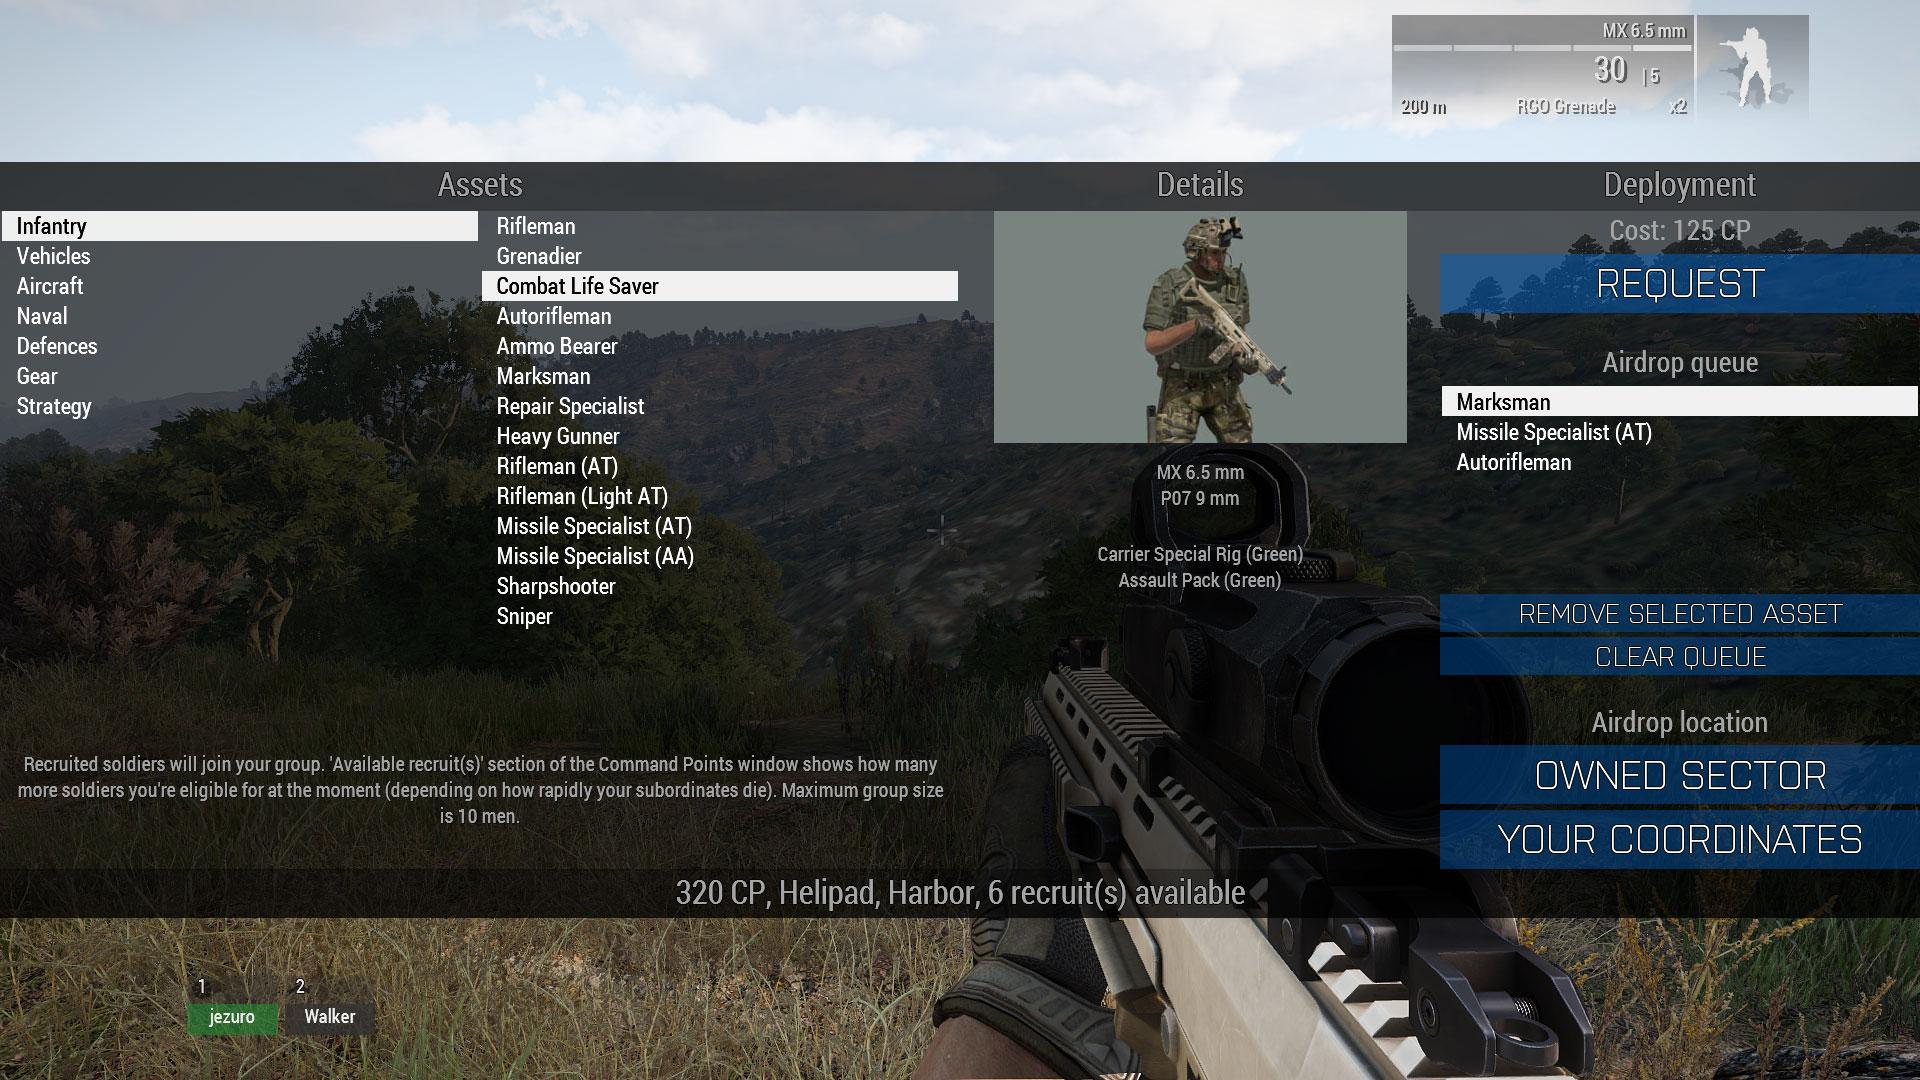 https://dev.arma3.com/assets/img/post/images/warlords_shot_04.jpg